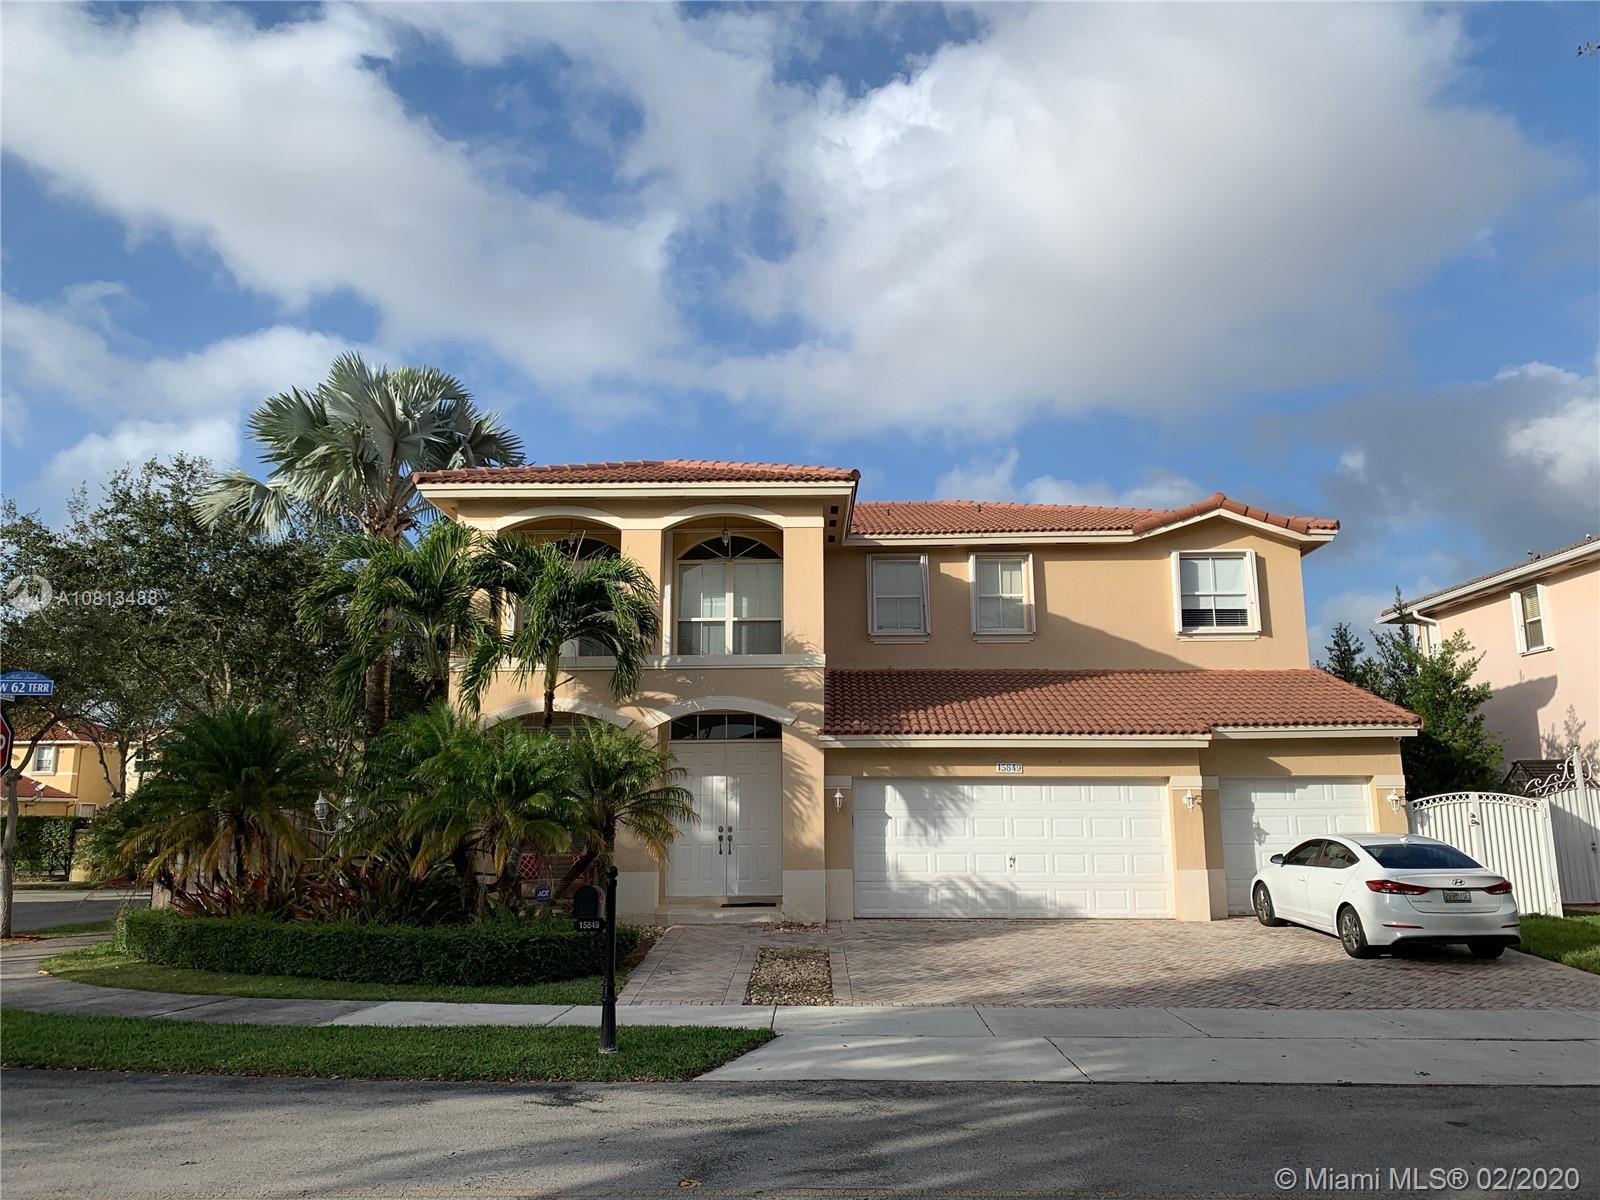 15849 SW 62nd Ter, Miami, FL 33193